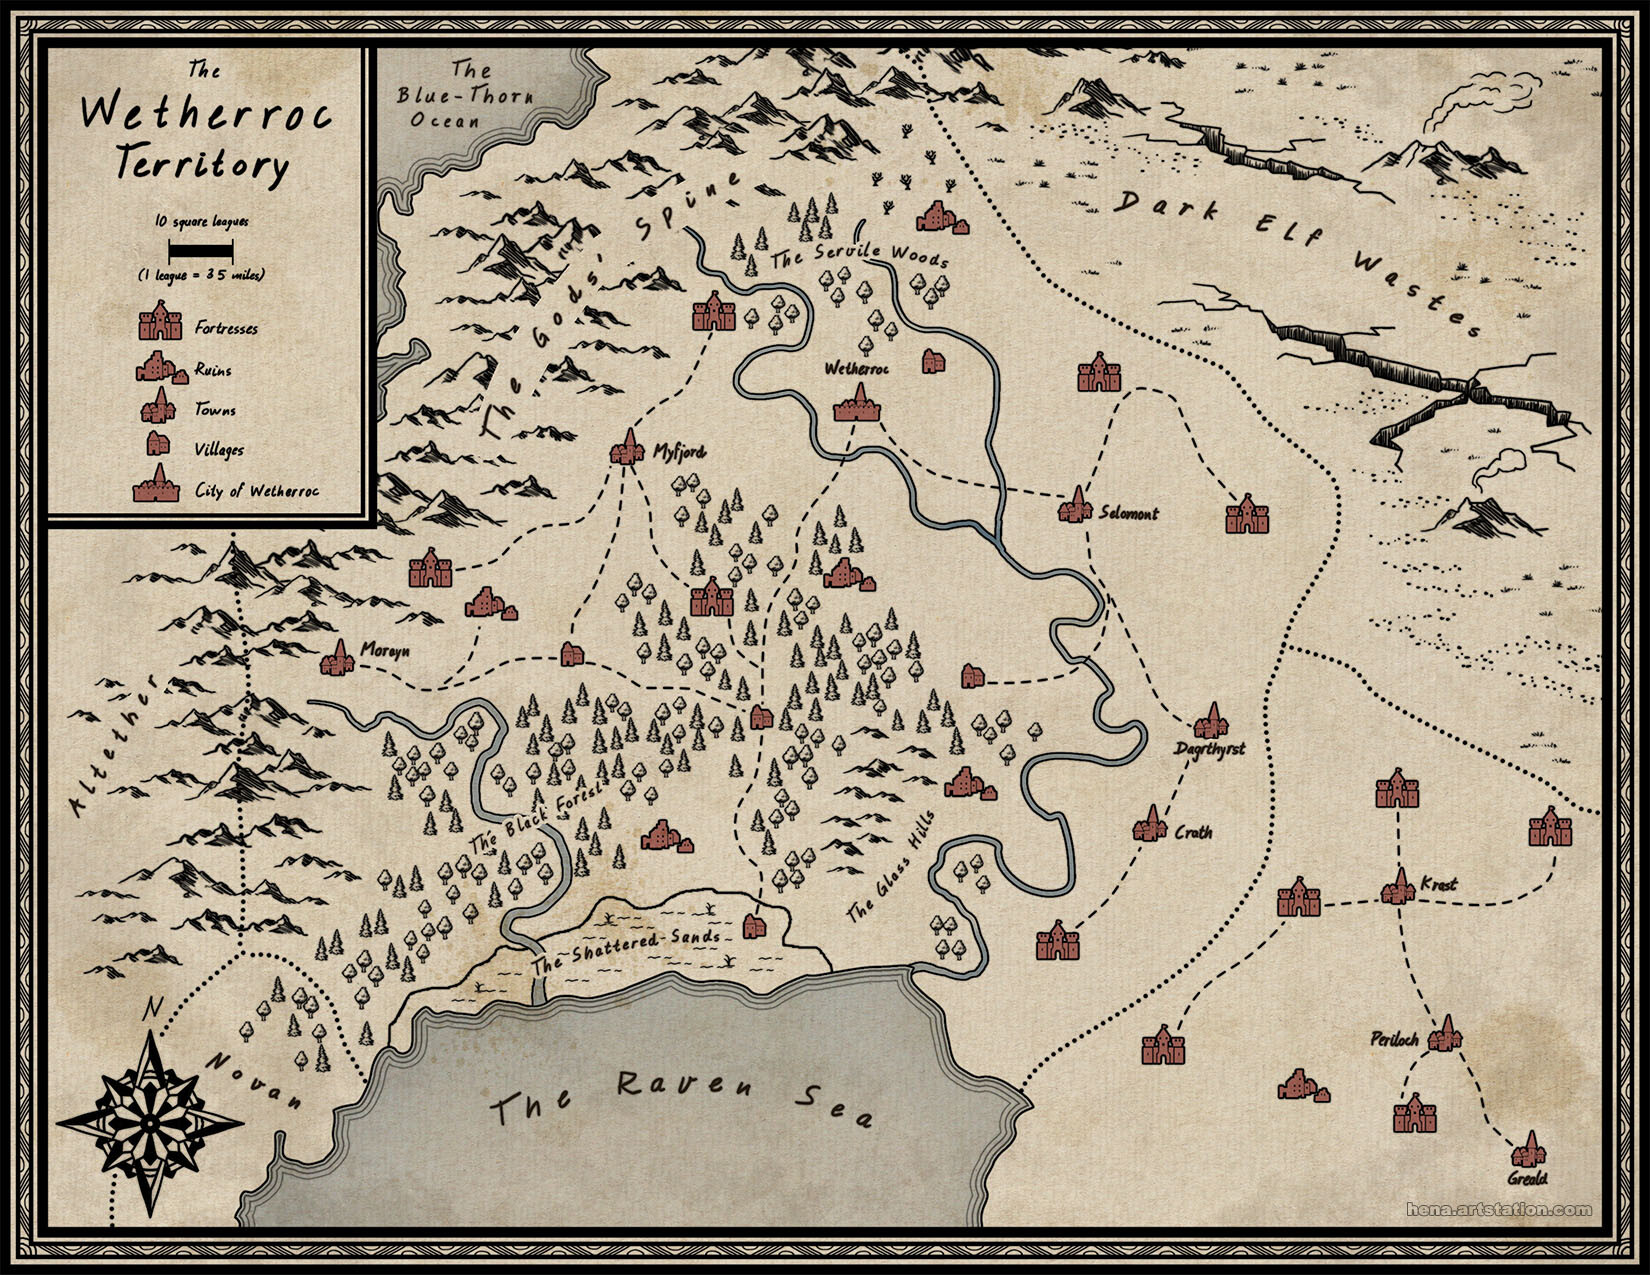 Map Art: Roodeht and Wetherroc